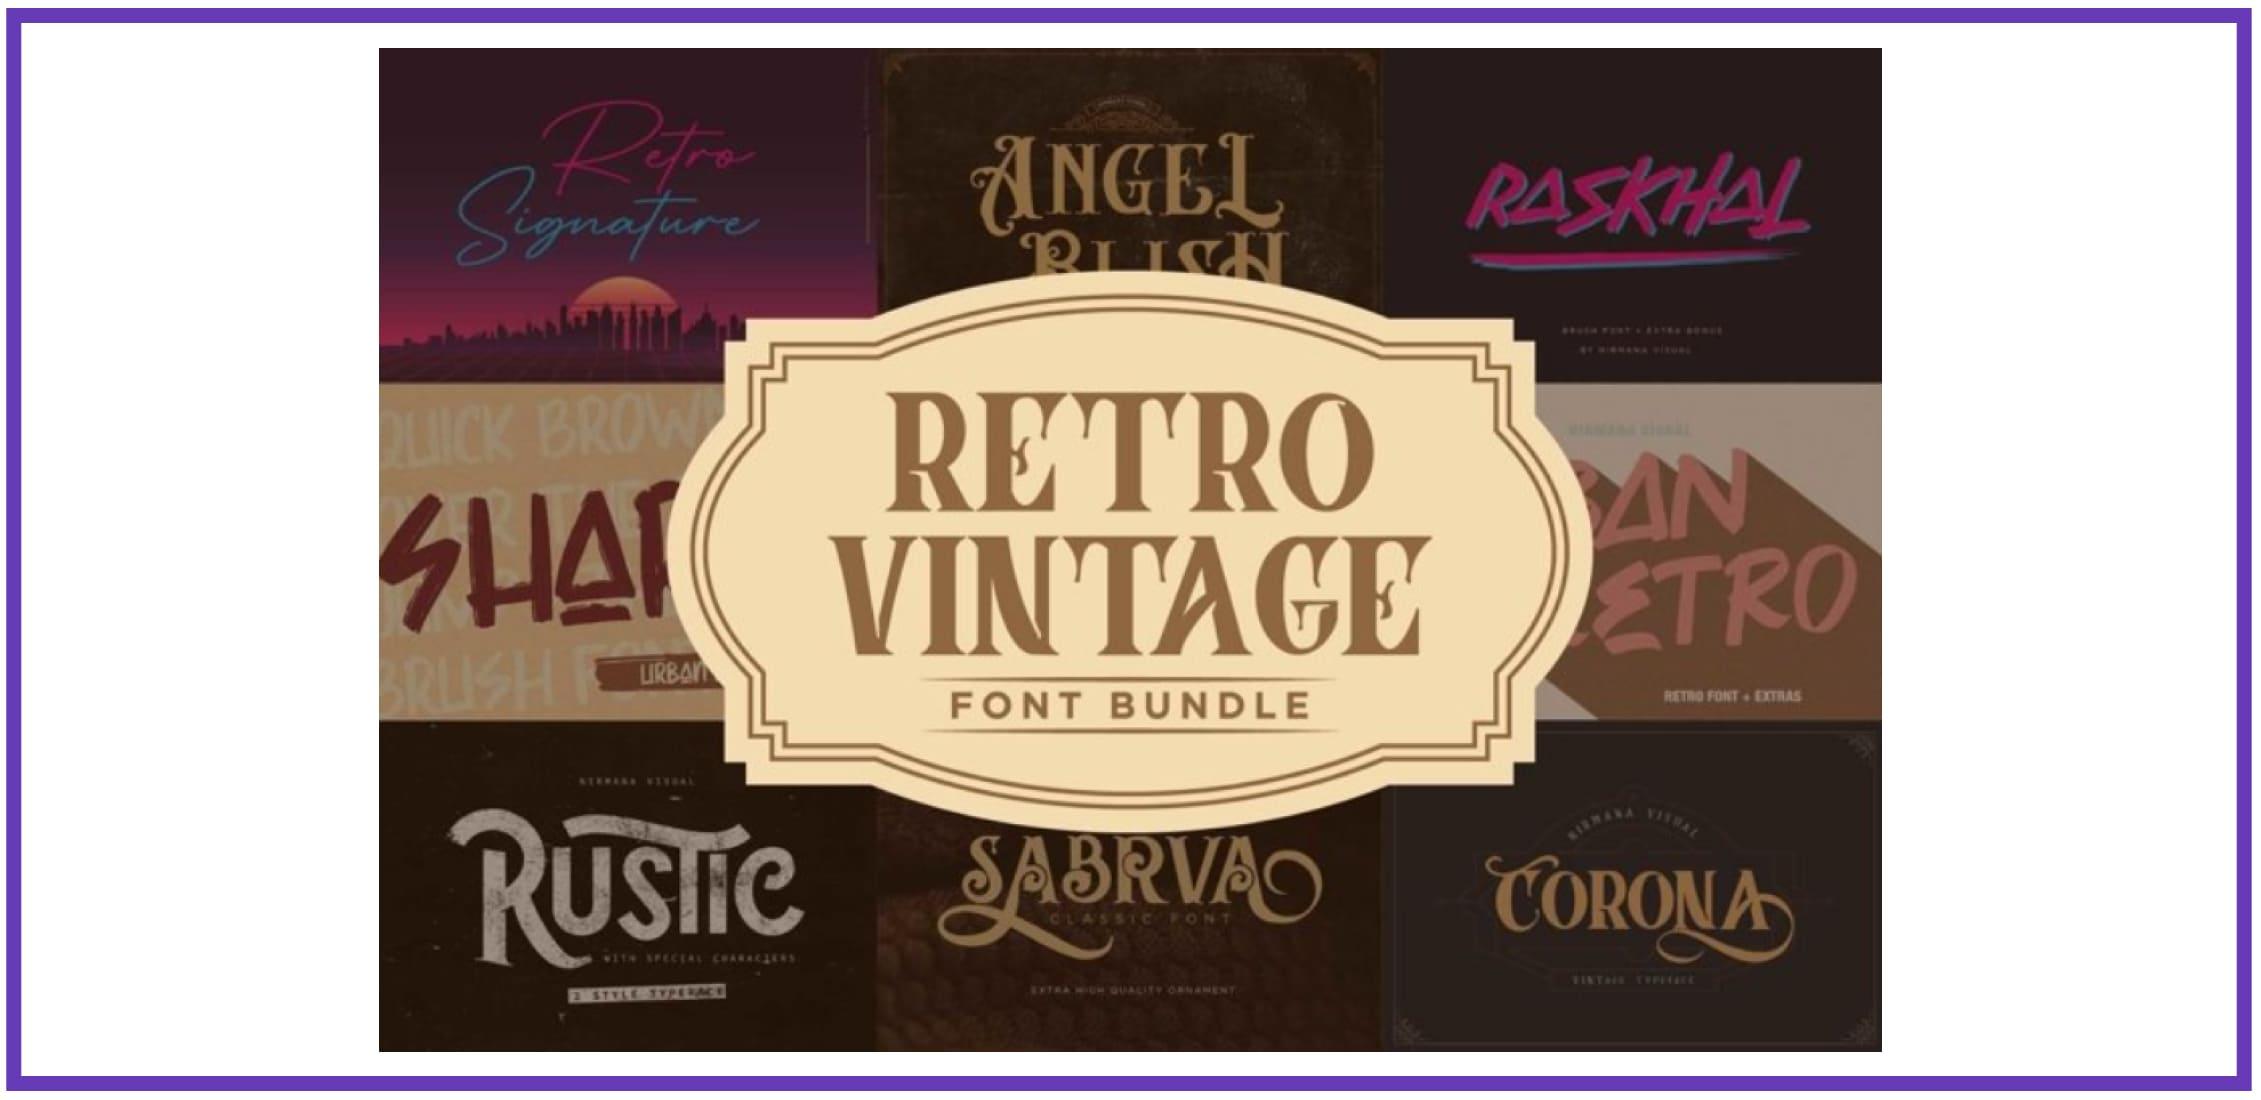 Retro Vintage Font Bundle. Best Industrial Fonts.